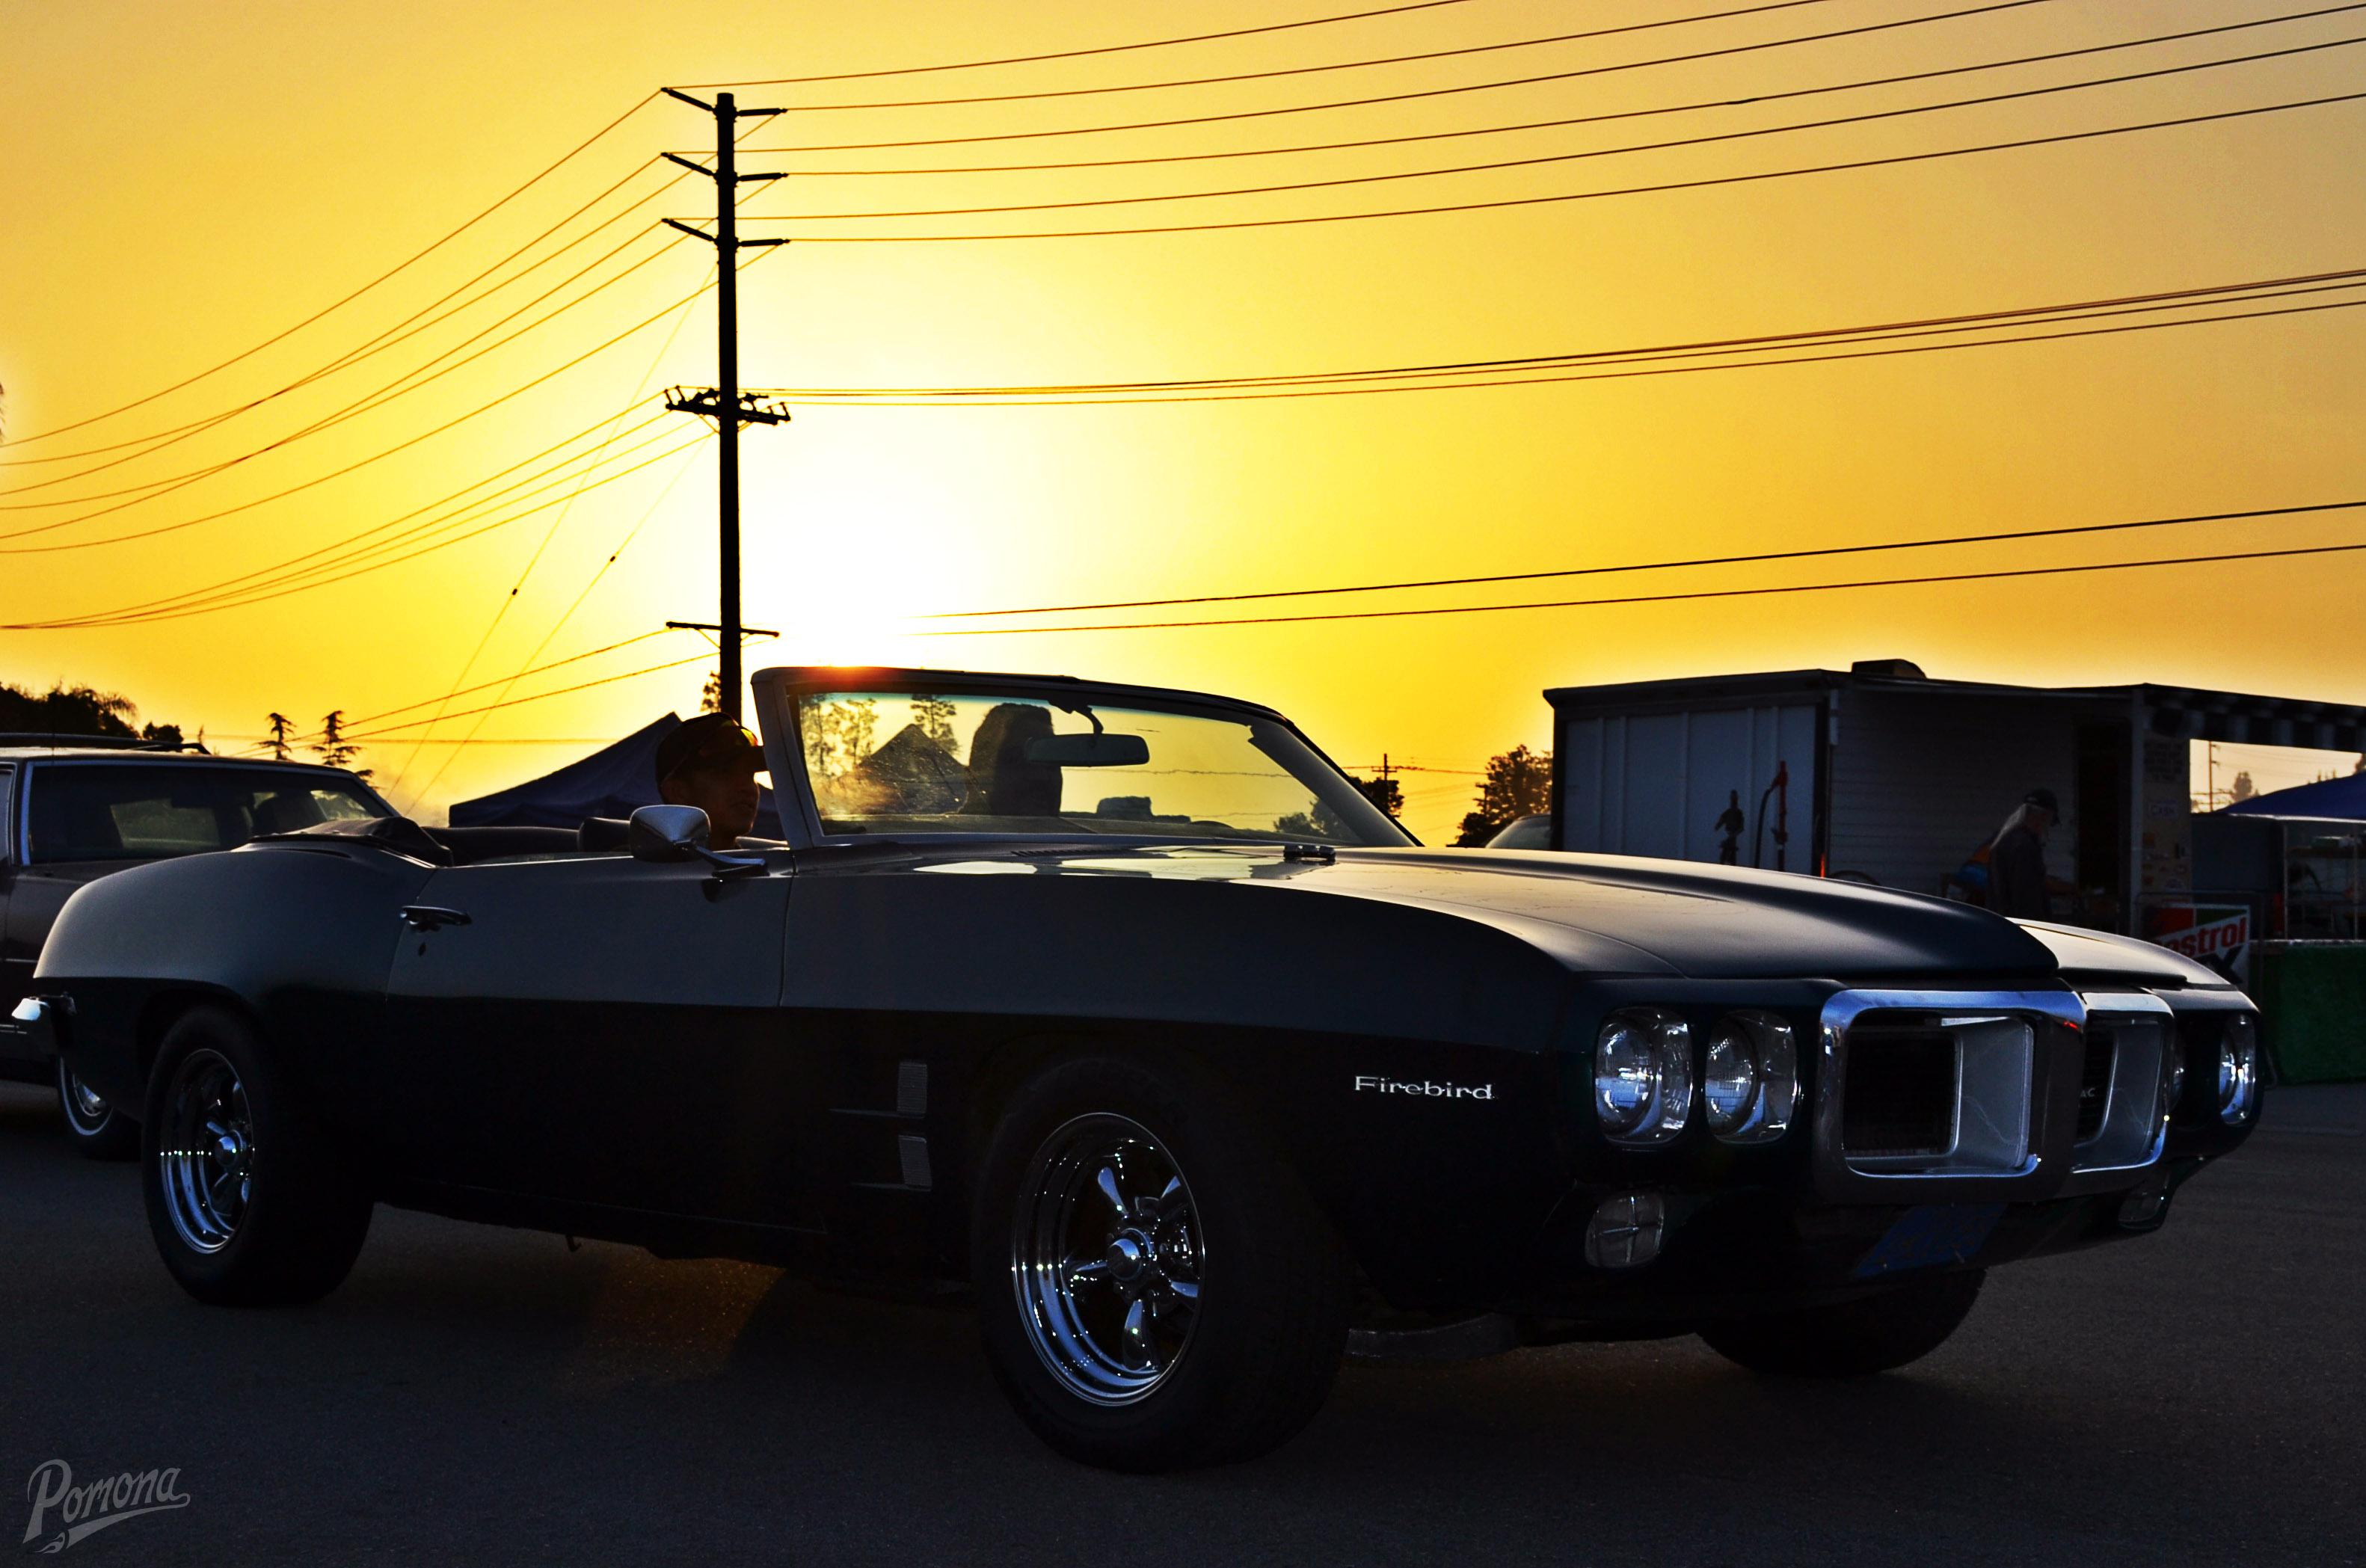 Classic Pontiac Firebird Convertible